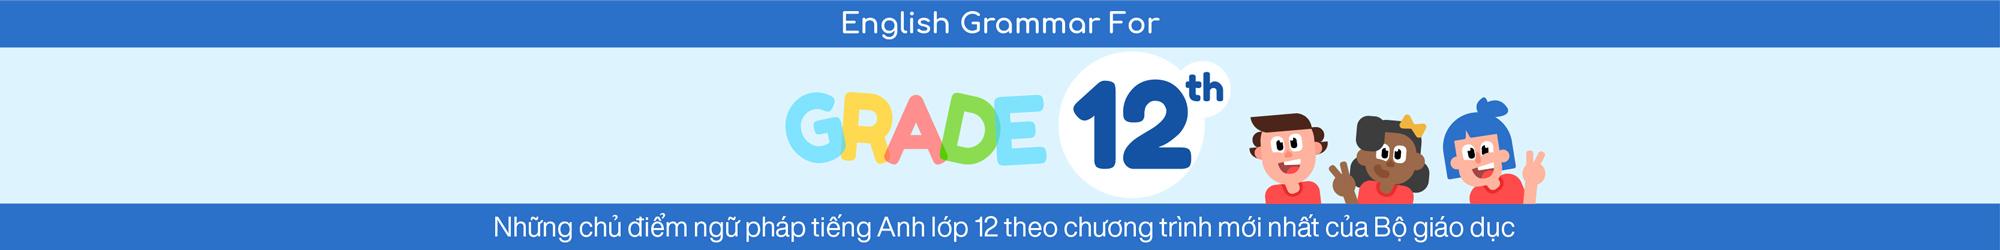 ENGLISH GRAMMAR FOR 12TH GRADE banner